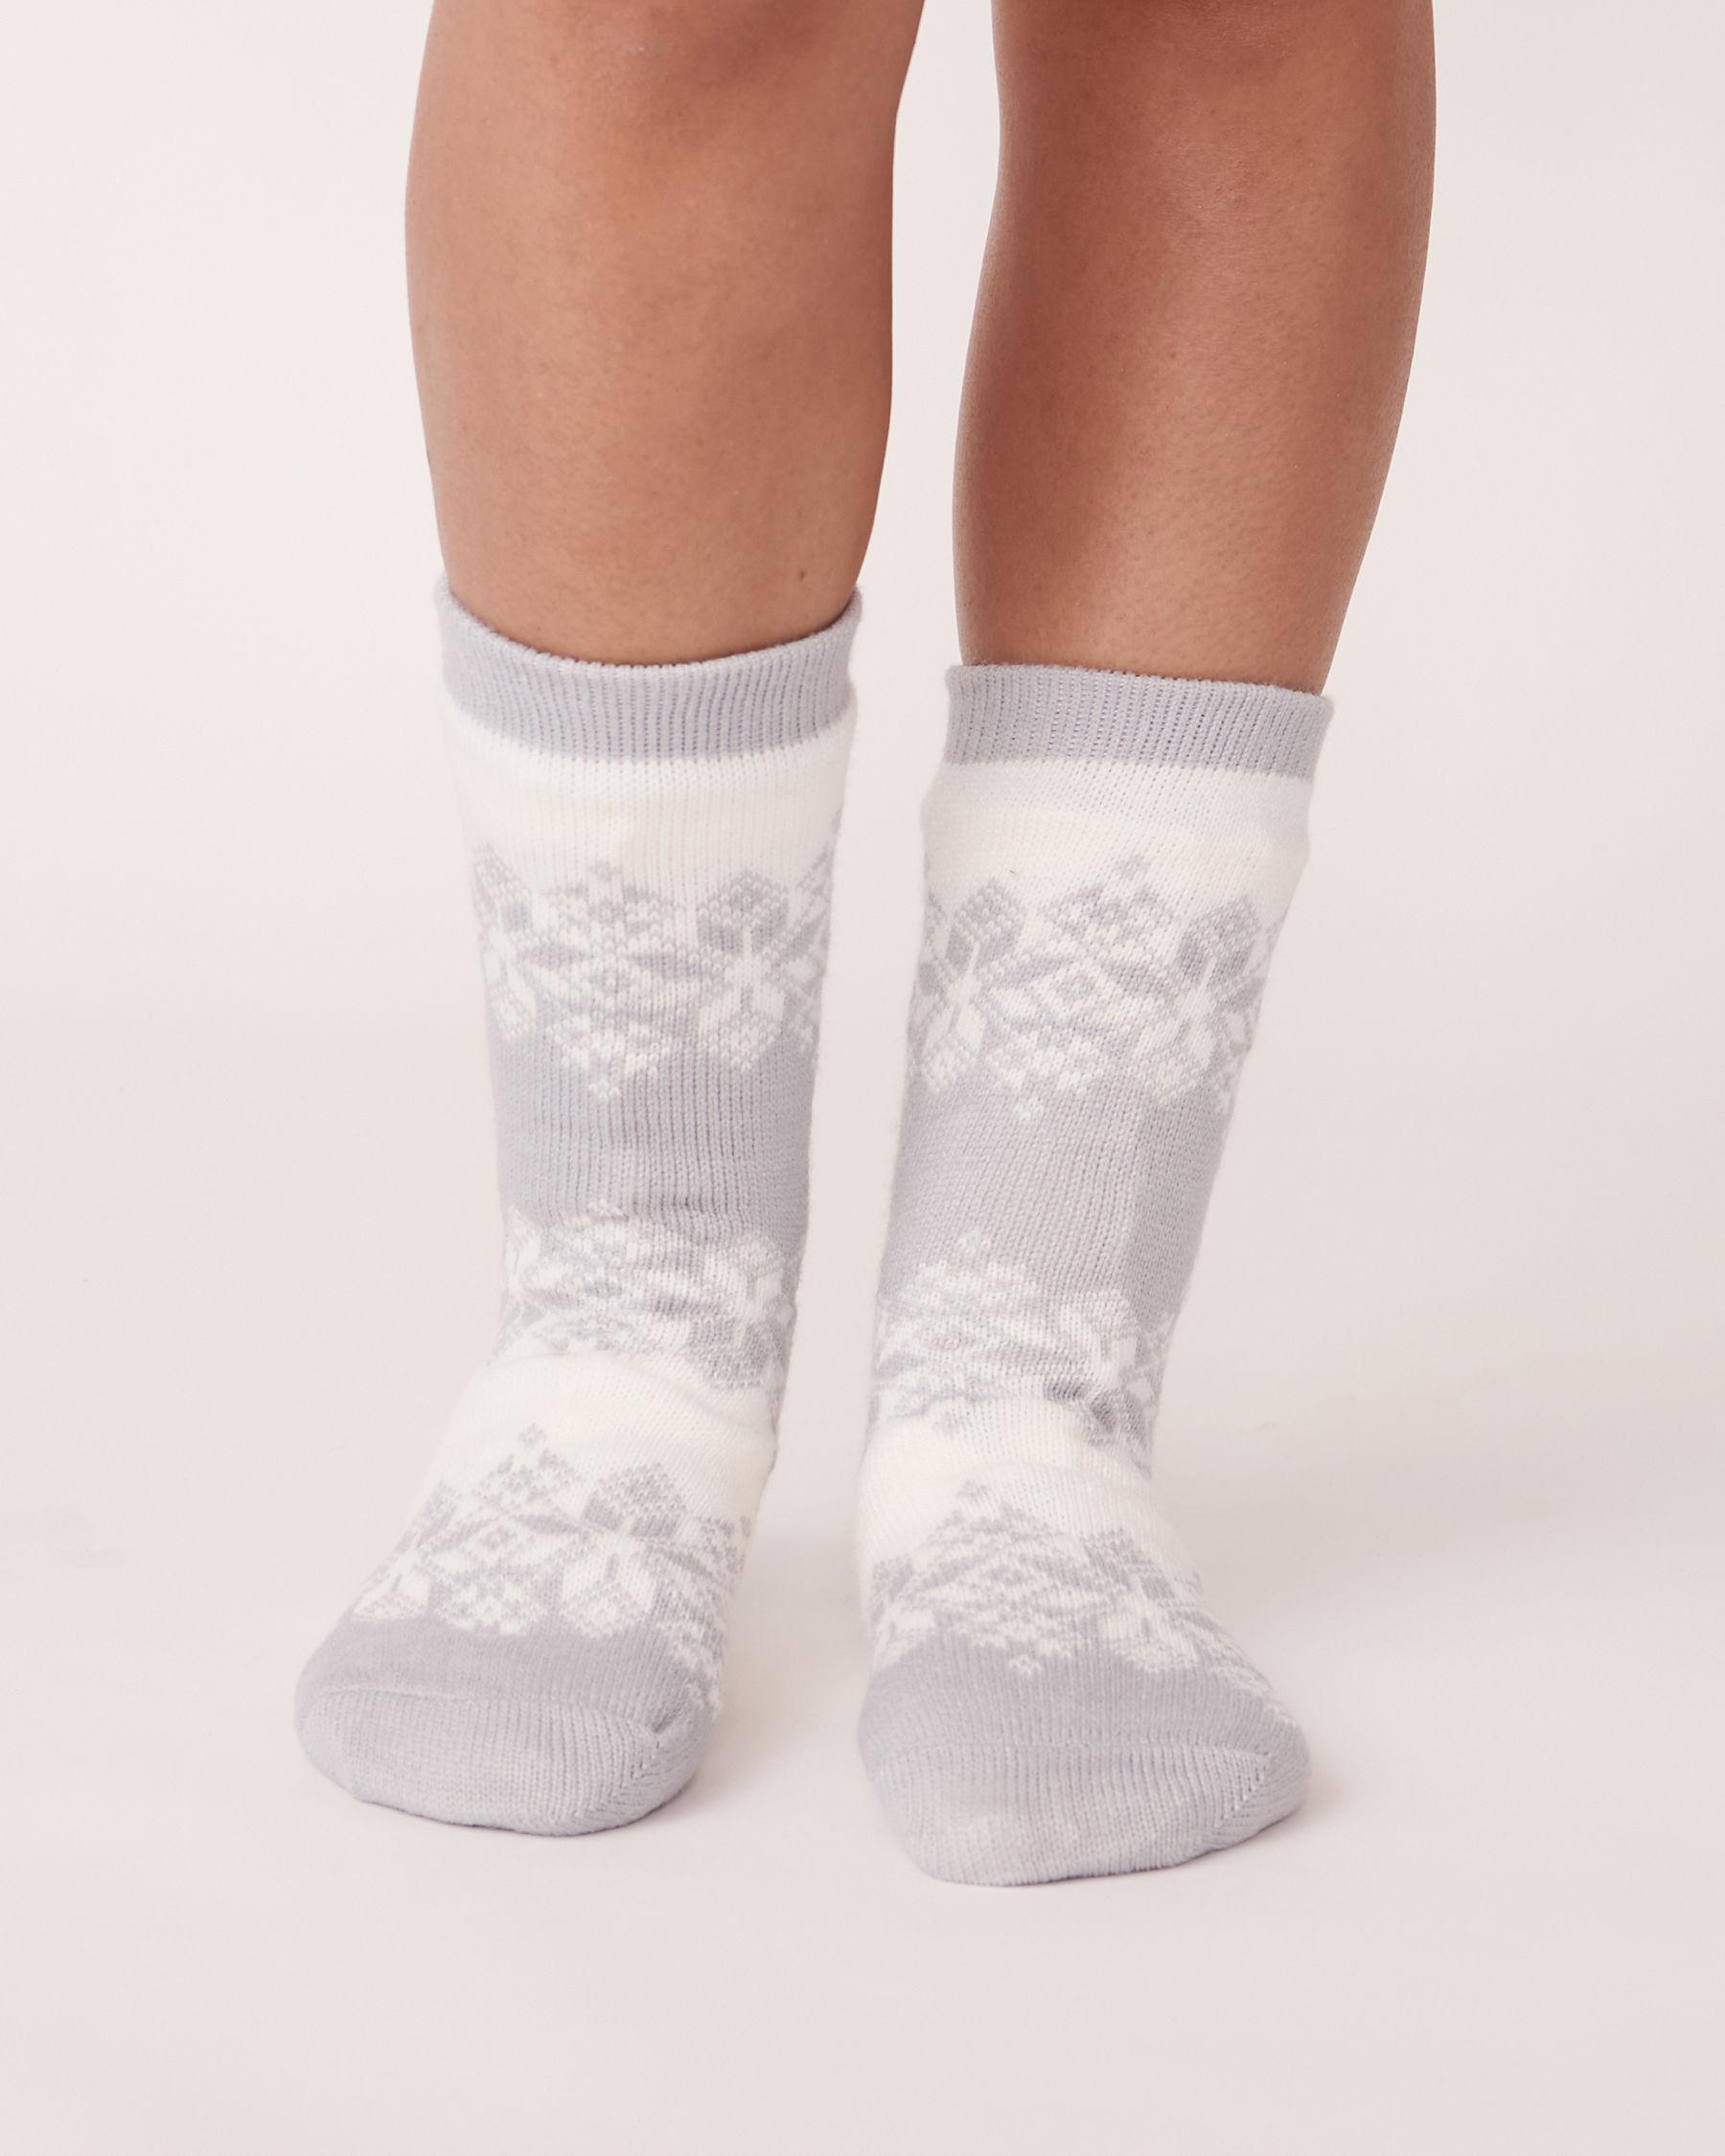 LA VIE EN ROSE Nordic Print Knit and Sherpa Socks Grey winter 554-514-0-09 - View1